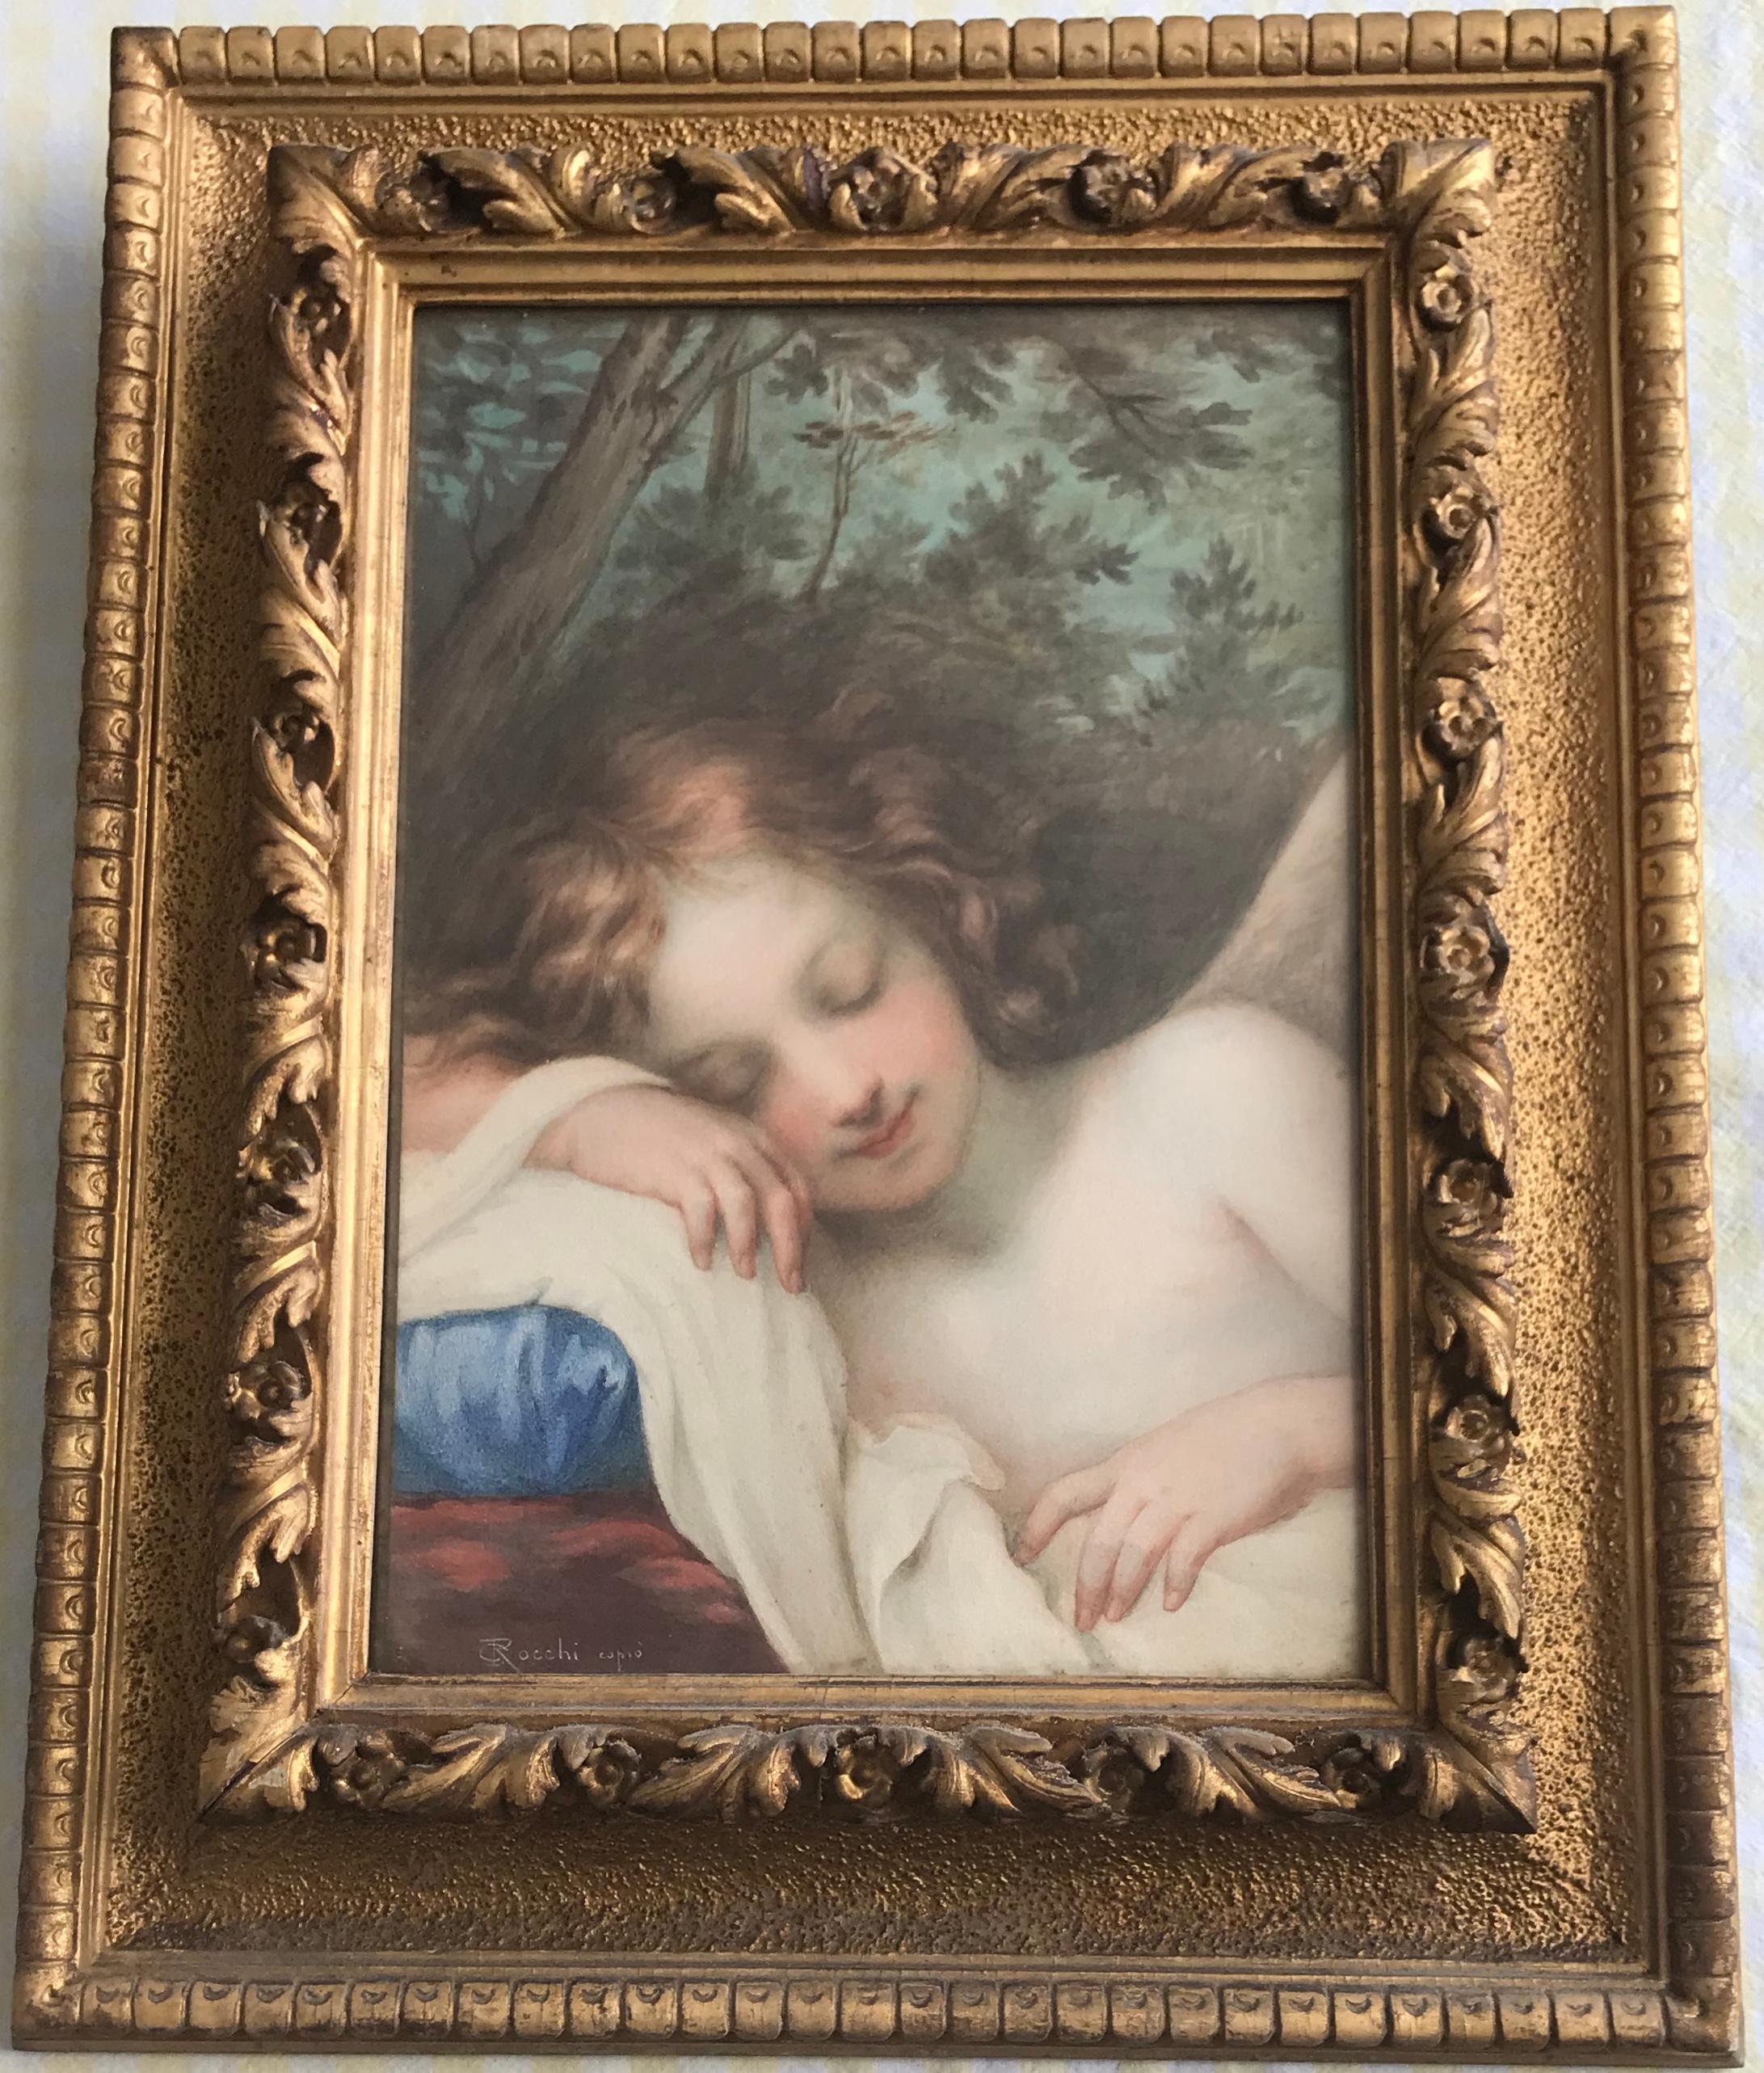 After Old Master Baldassarre Franceschini, Sleeping Cupid